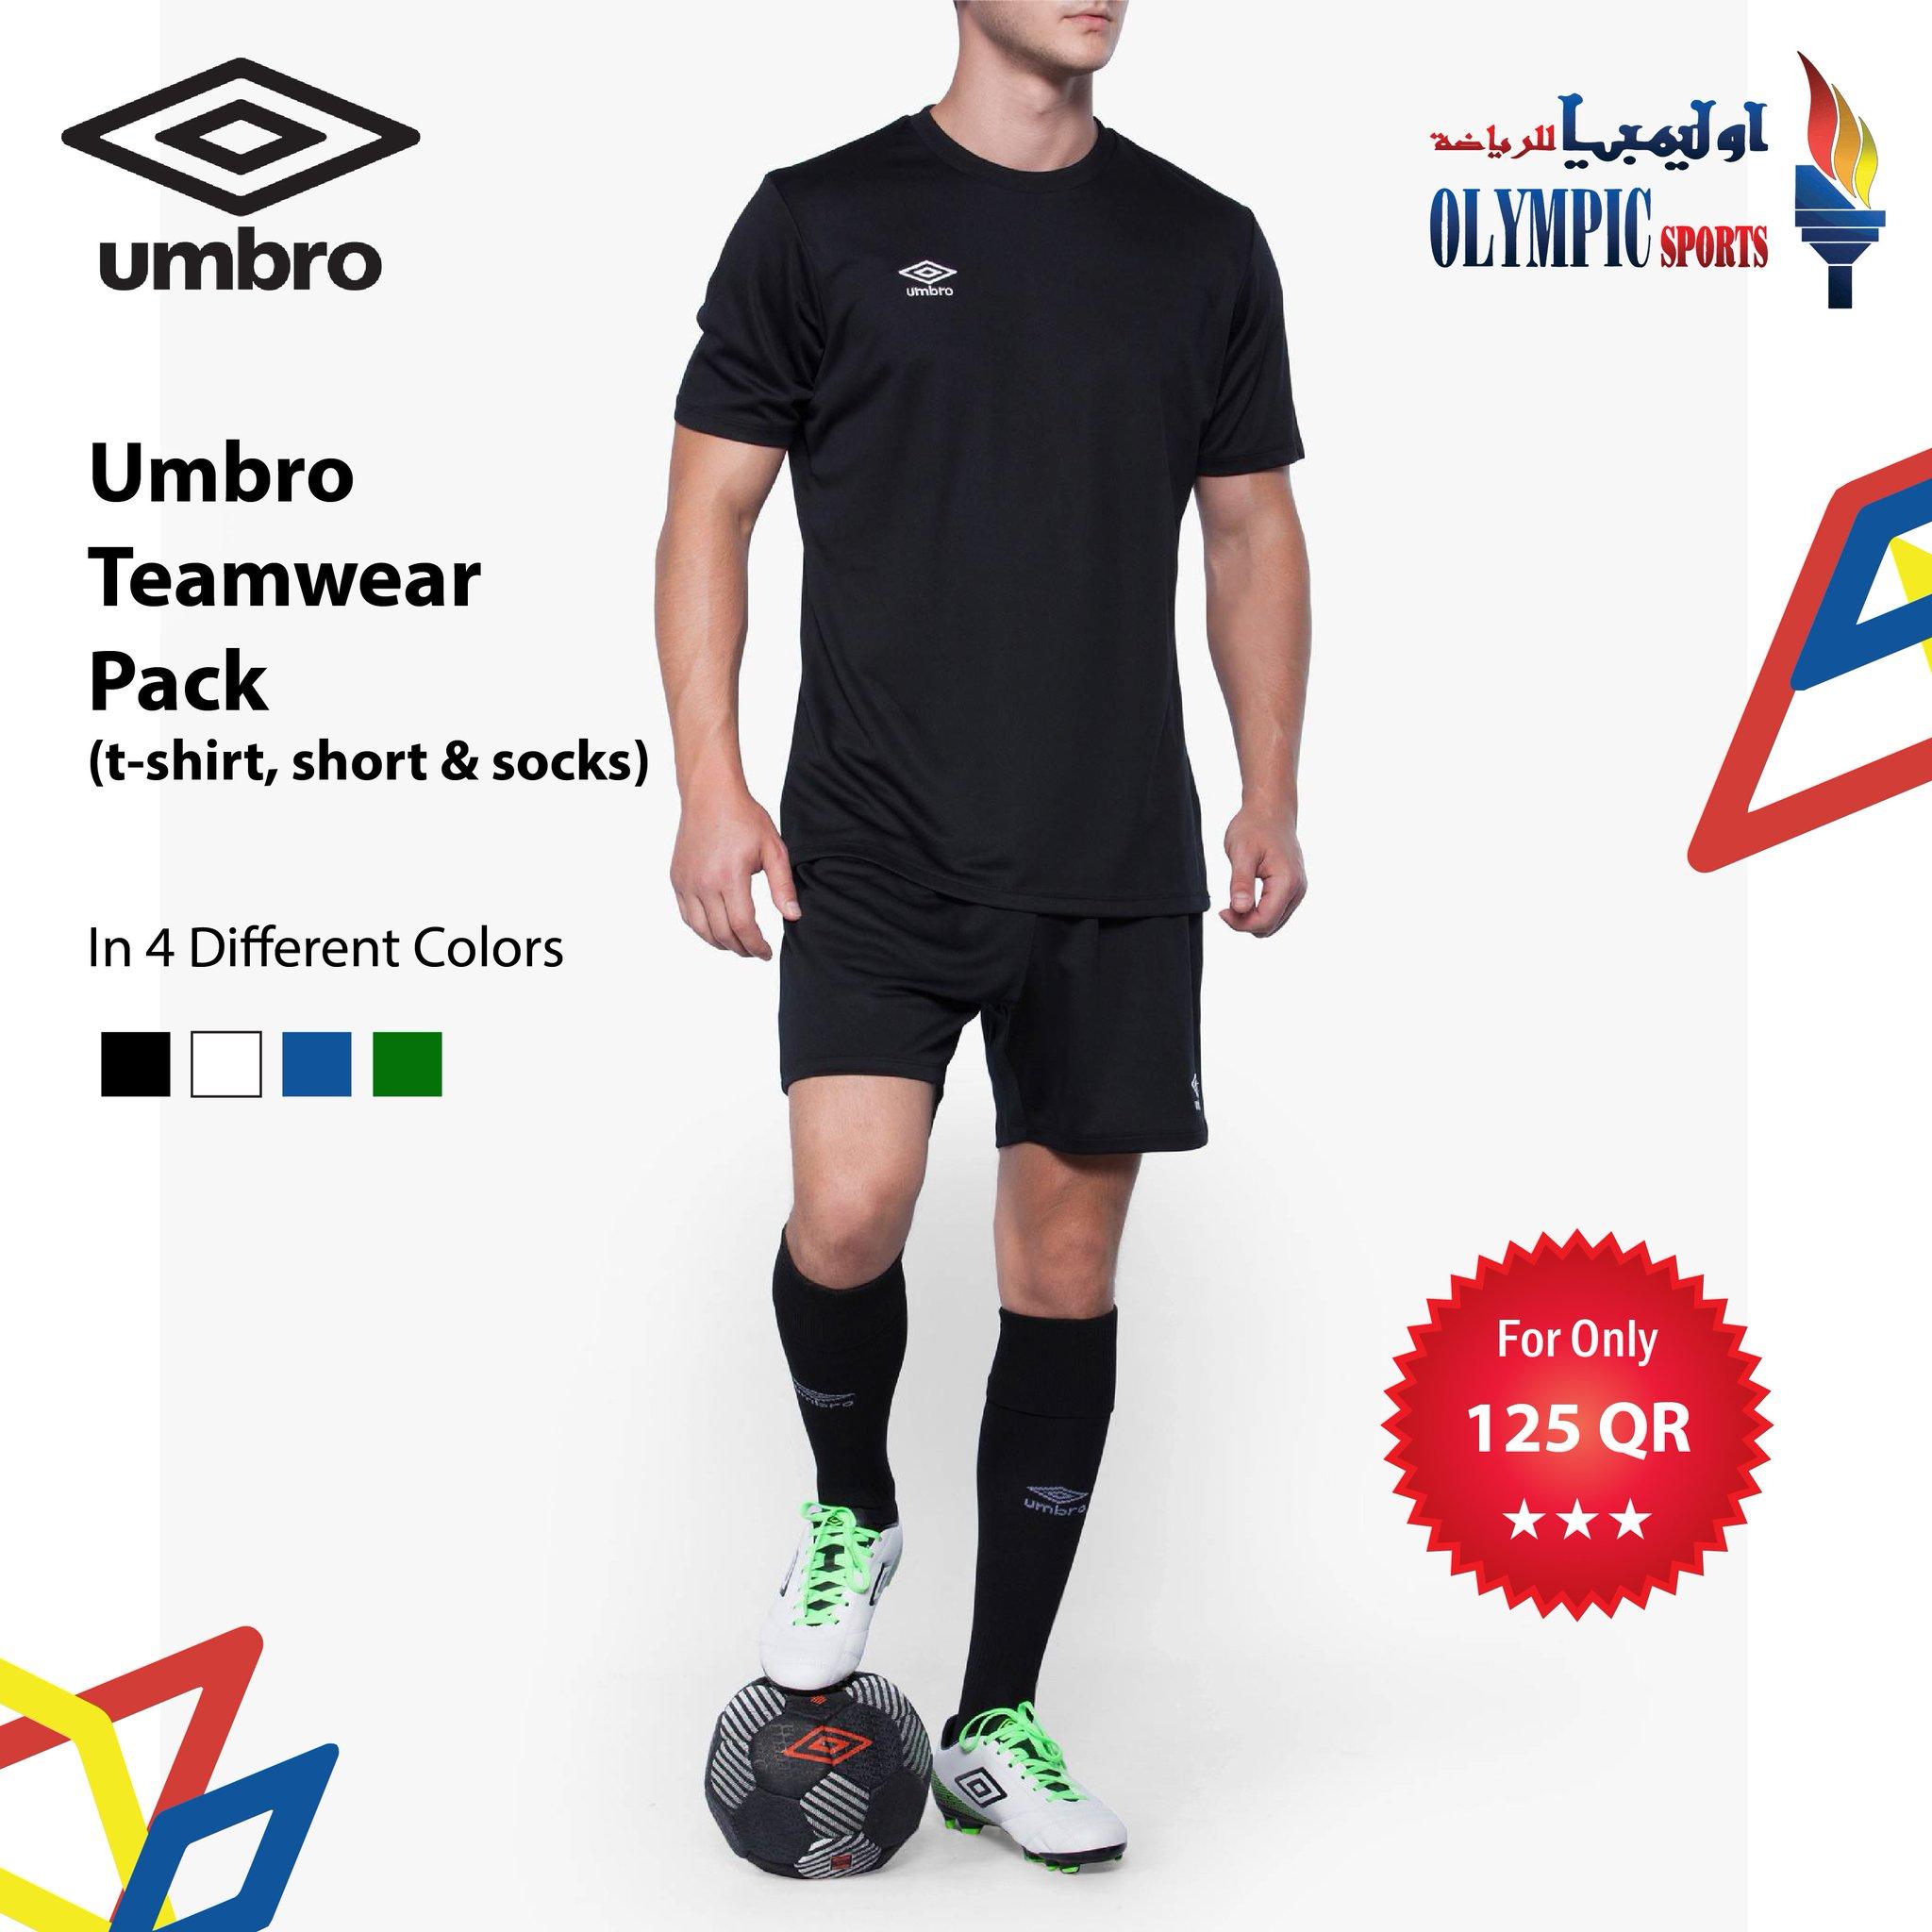 umbro team wear